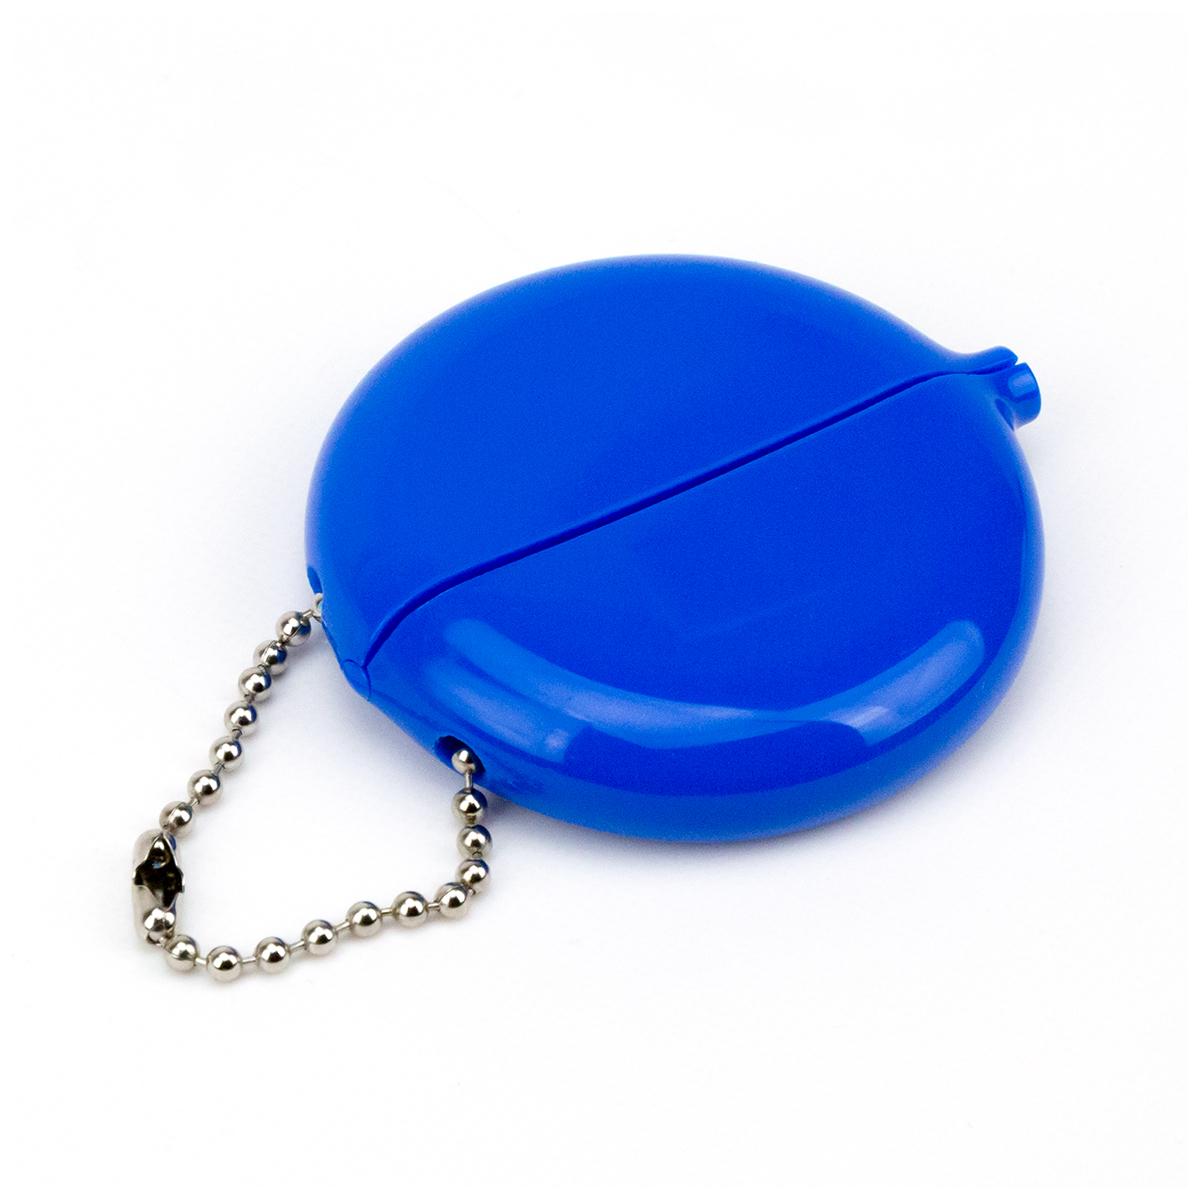 Balls Retro Rubber Coin Keychain